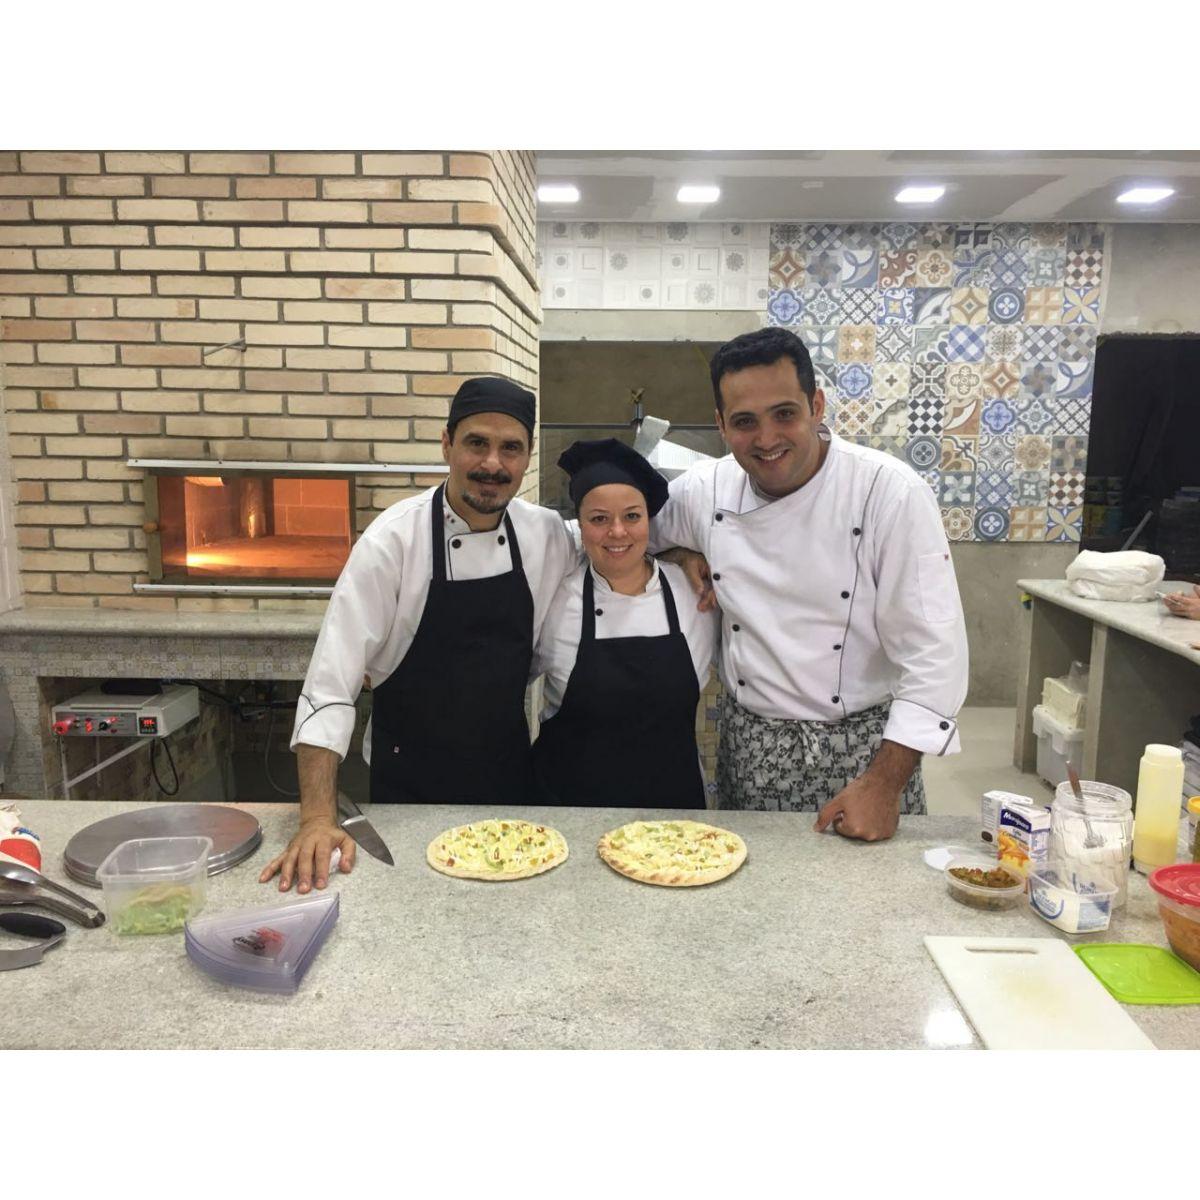 CURSO PARA ESFIHEIROS, AMANTES DA BOA PIZZA E HOBBISTAS.  - Fórum de Pizzas Vendas online